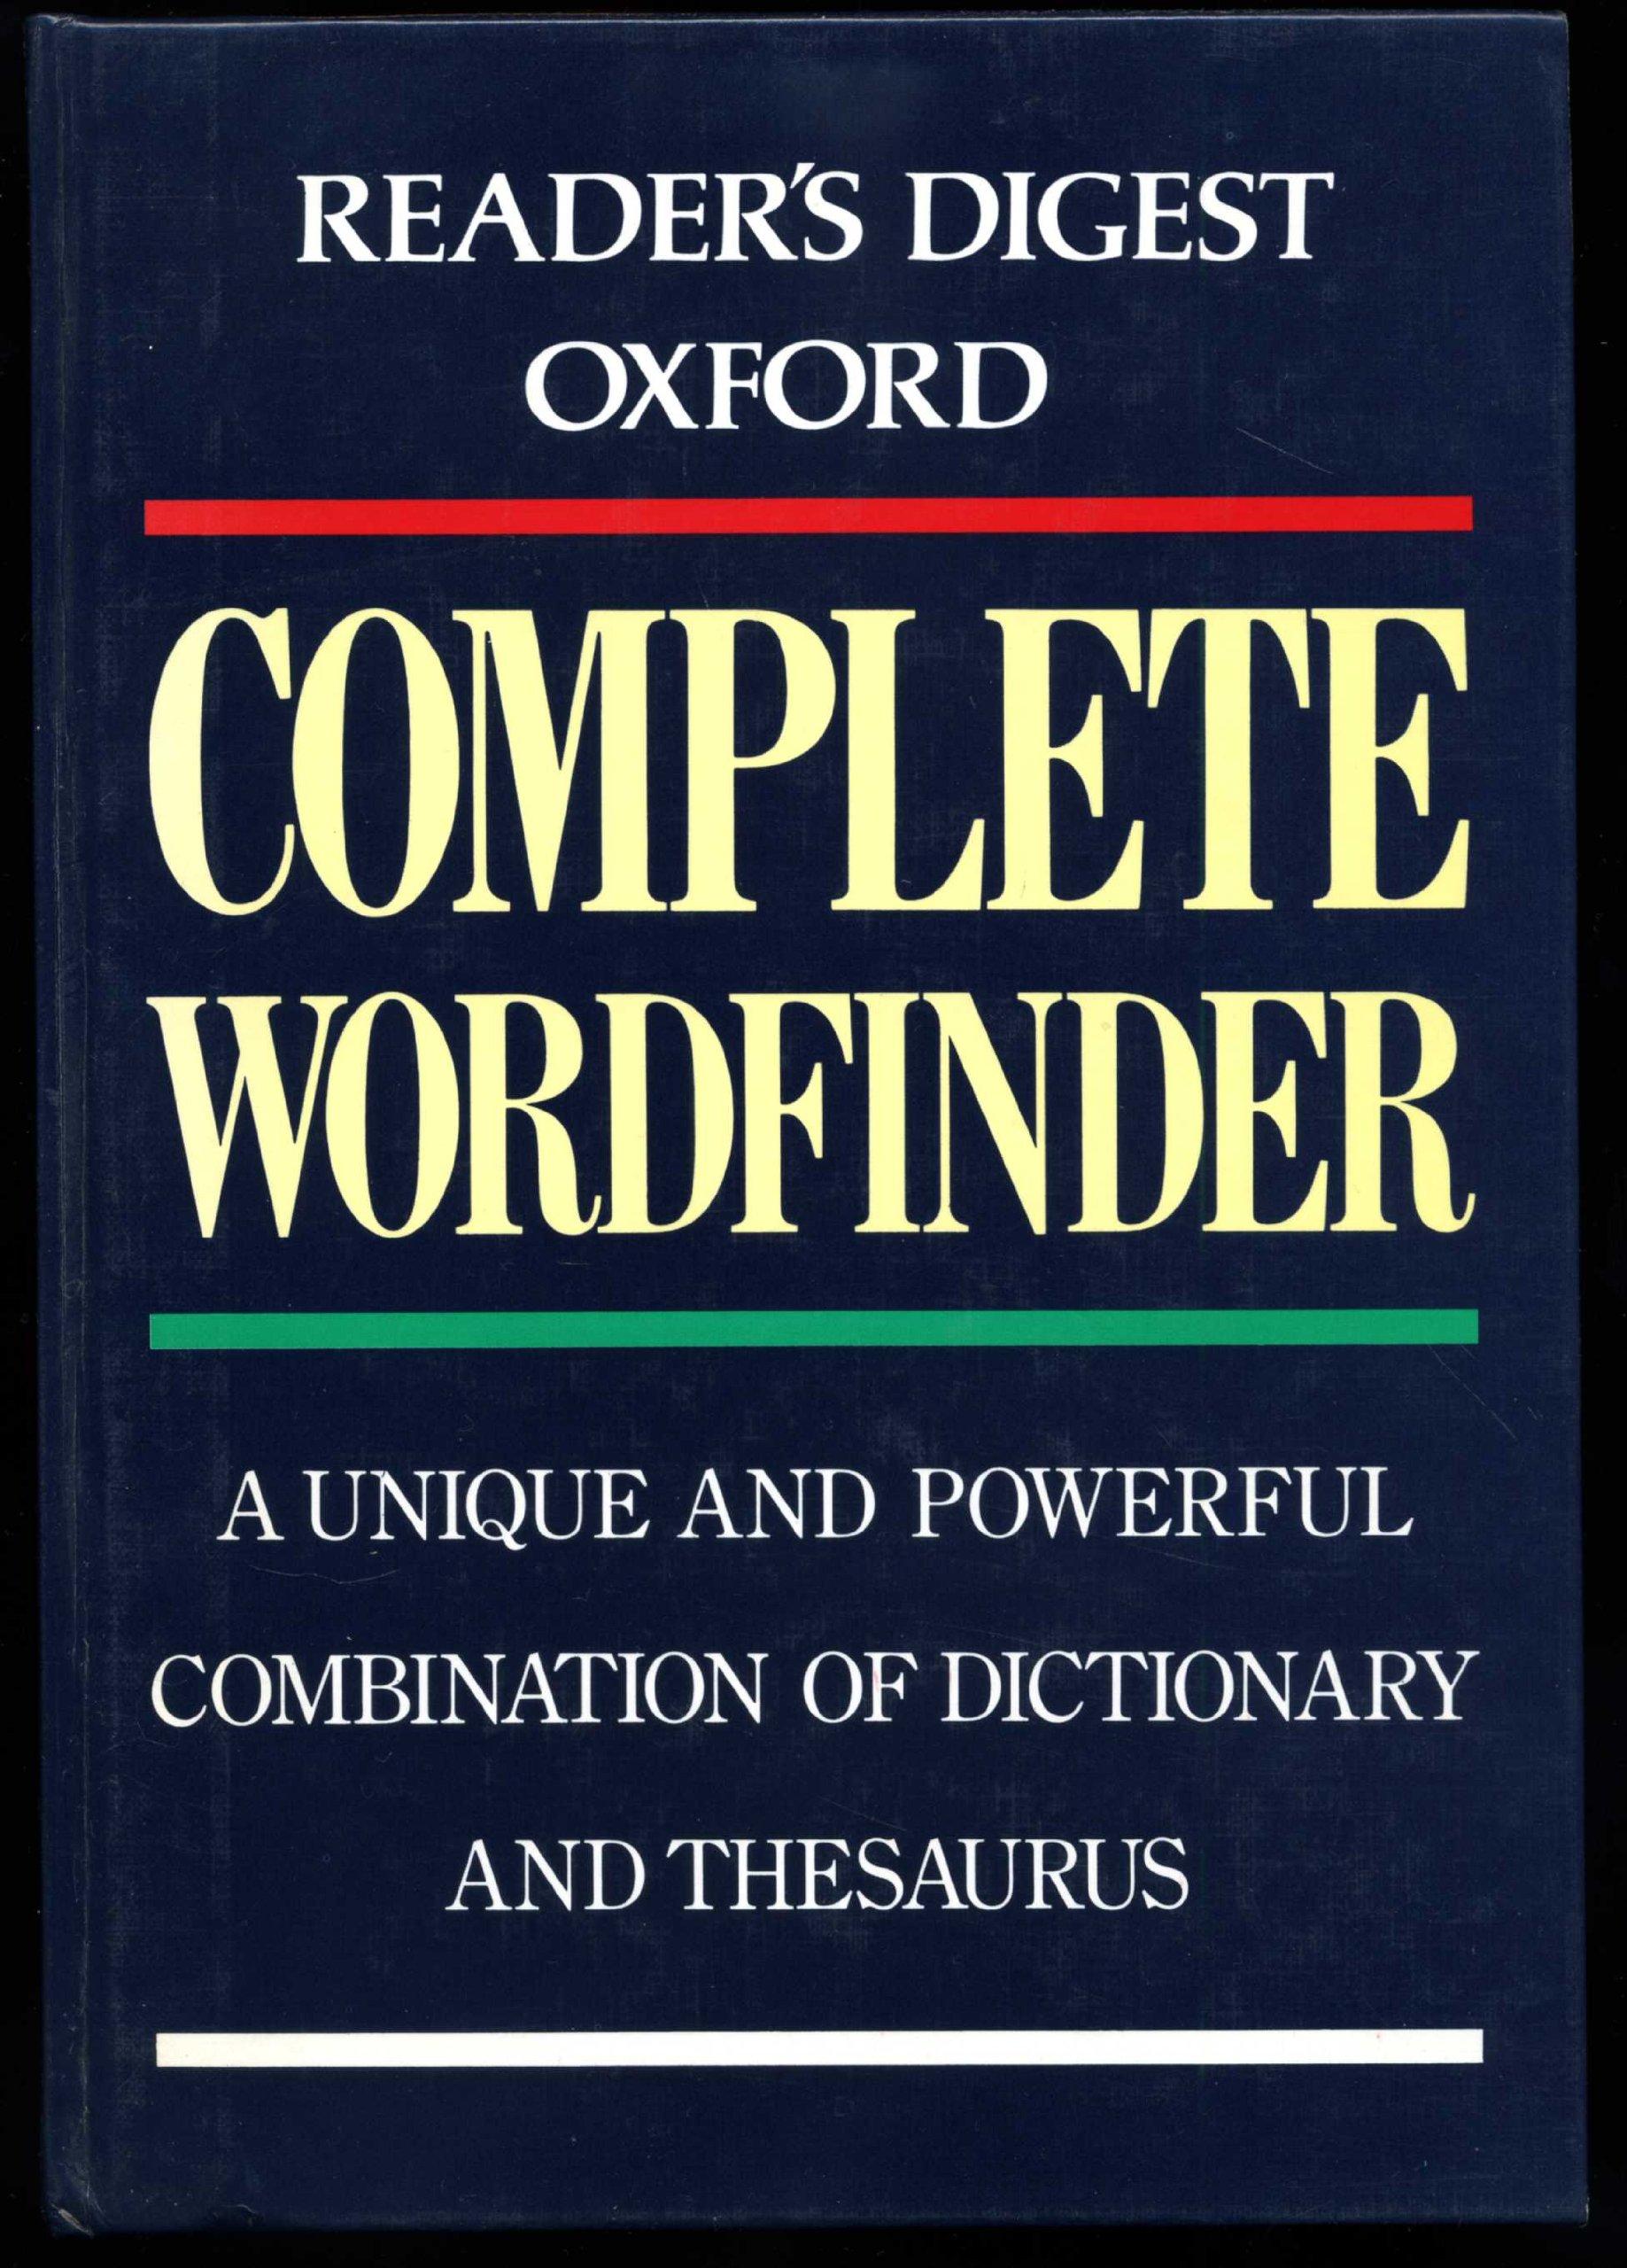 Reader's Digest Oxford Complete Wordfinder: Amazon.co.uk: Sara Tulloch:  9780276421013: Books